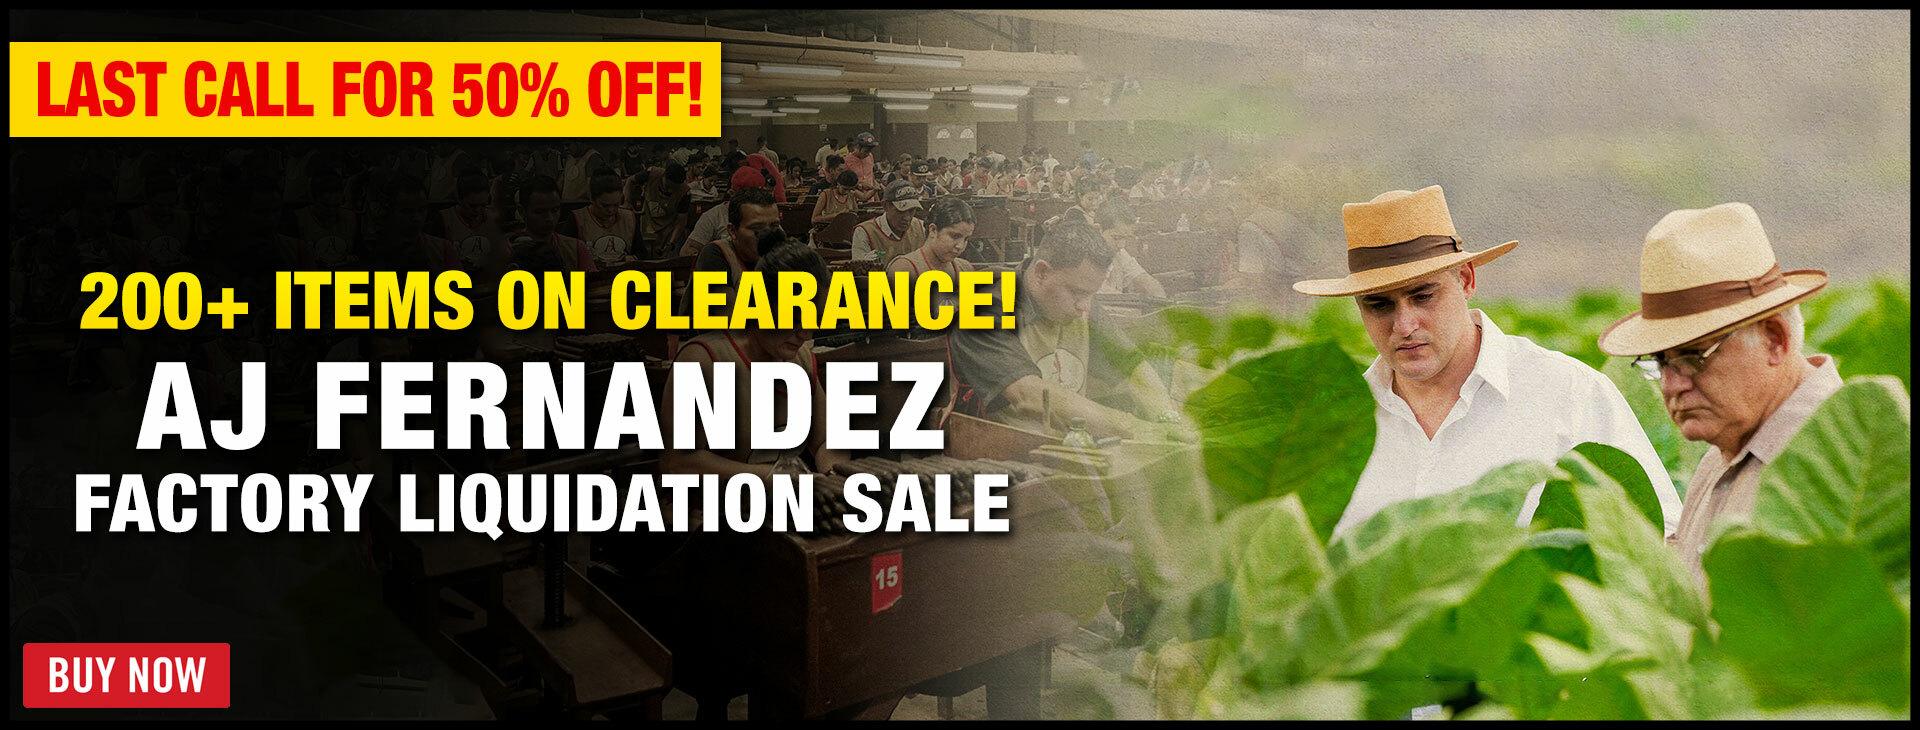 UP TO 50% OFF AJ FERNANDEZ CIGARS!